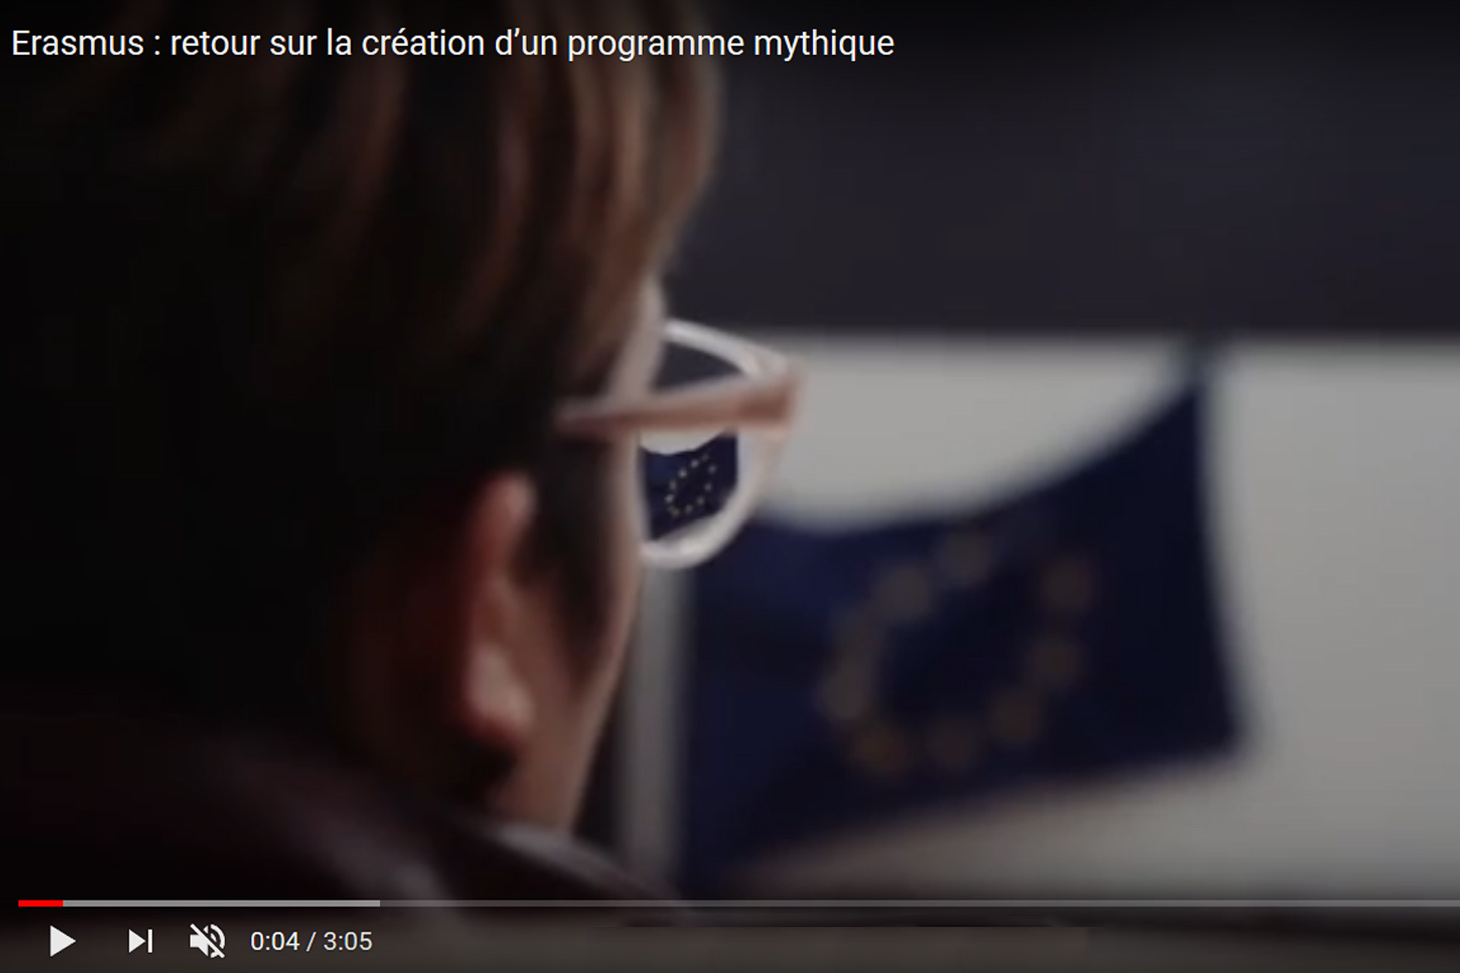 Erasmus, photo du film de Pierre Reynard sur la création de ce programme